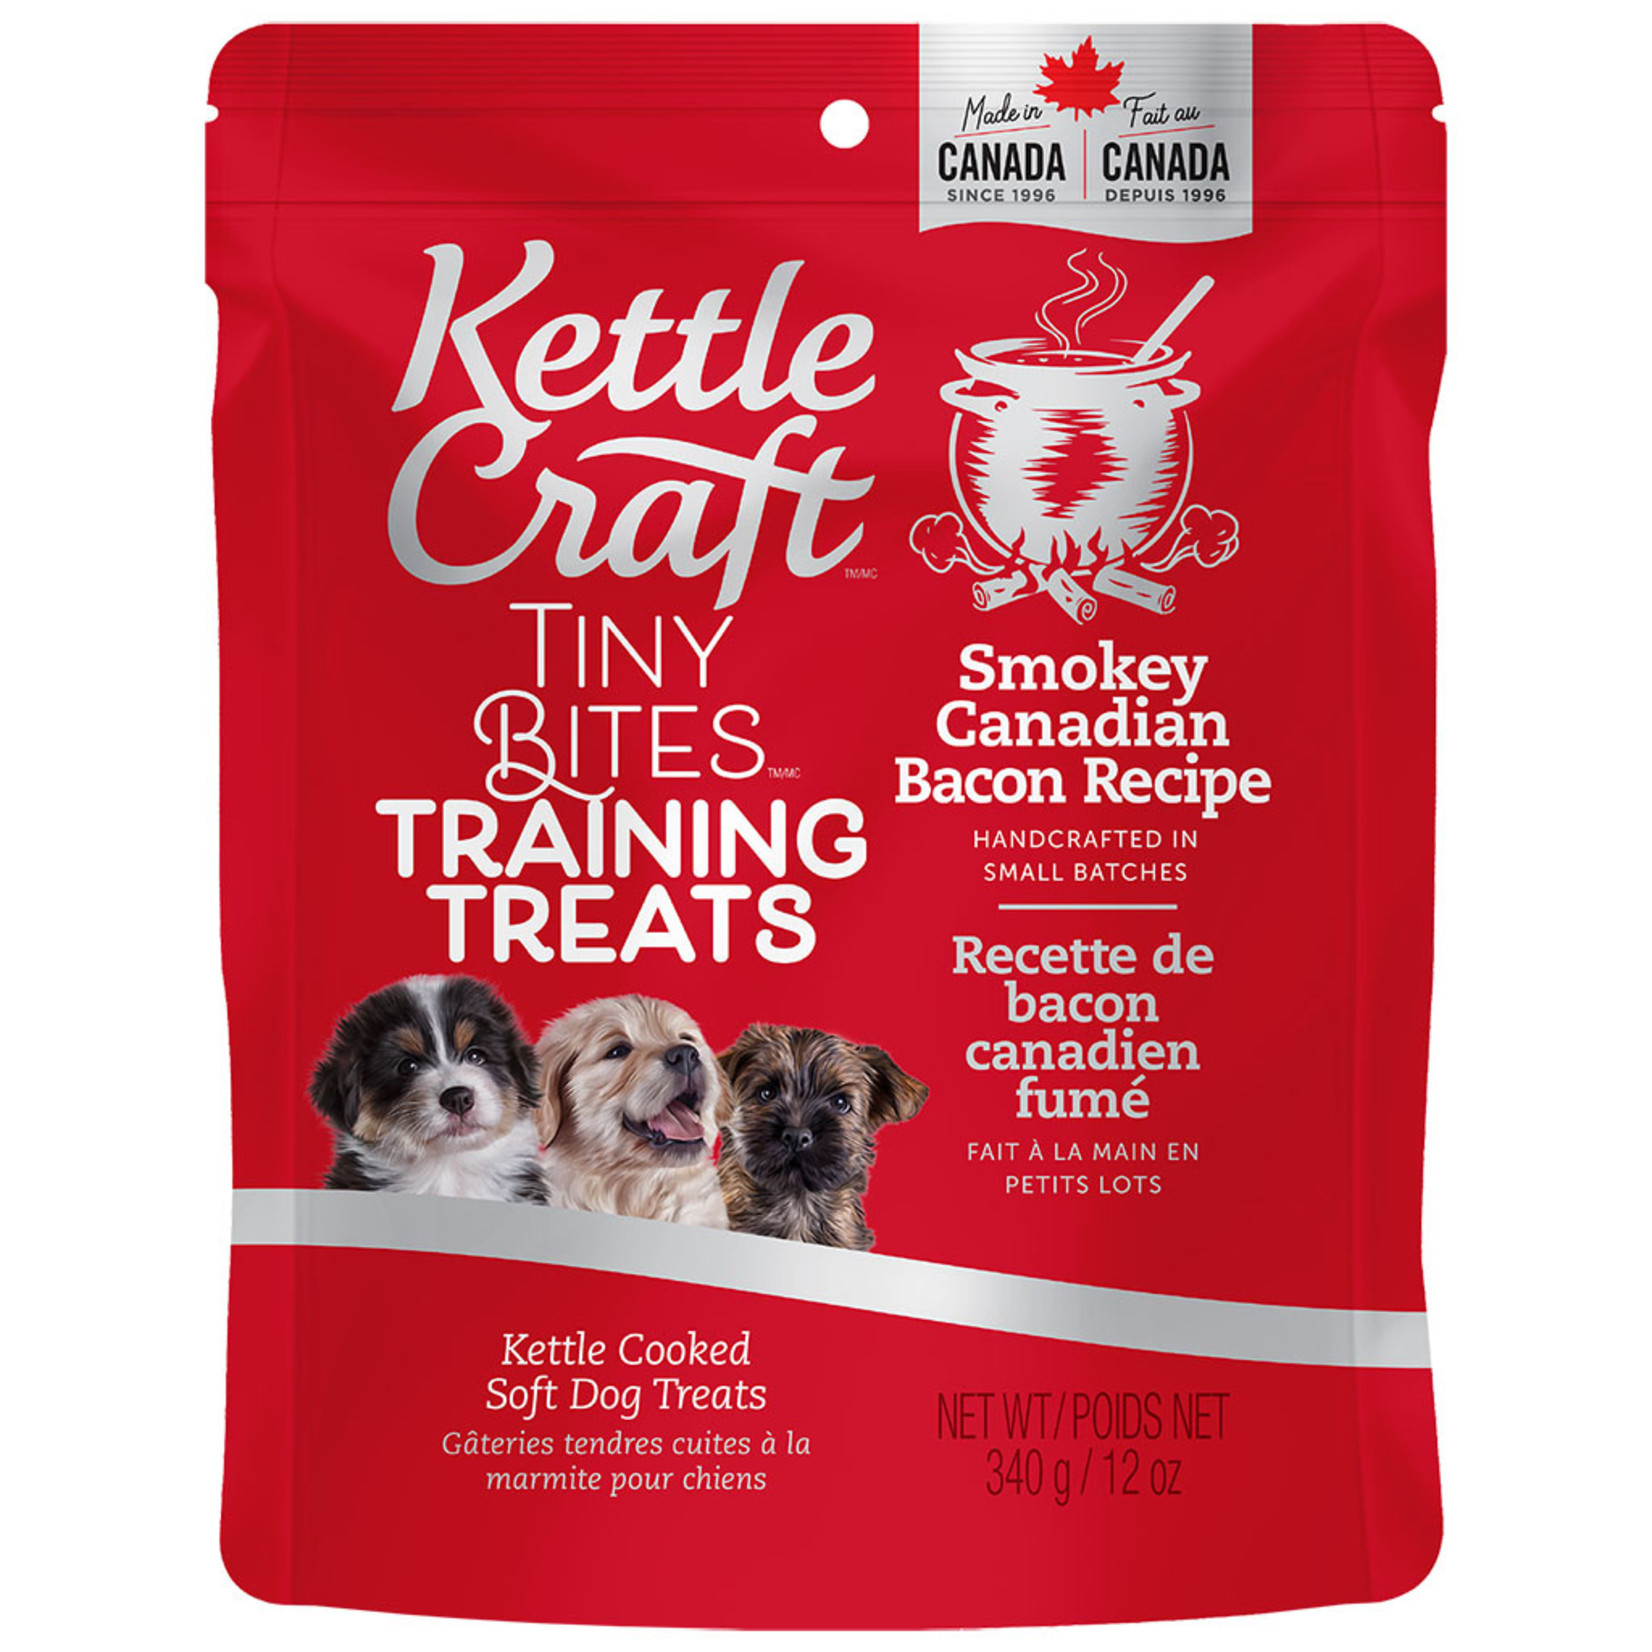 Jays Kettle Craft Tiny Bites Training treats